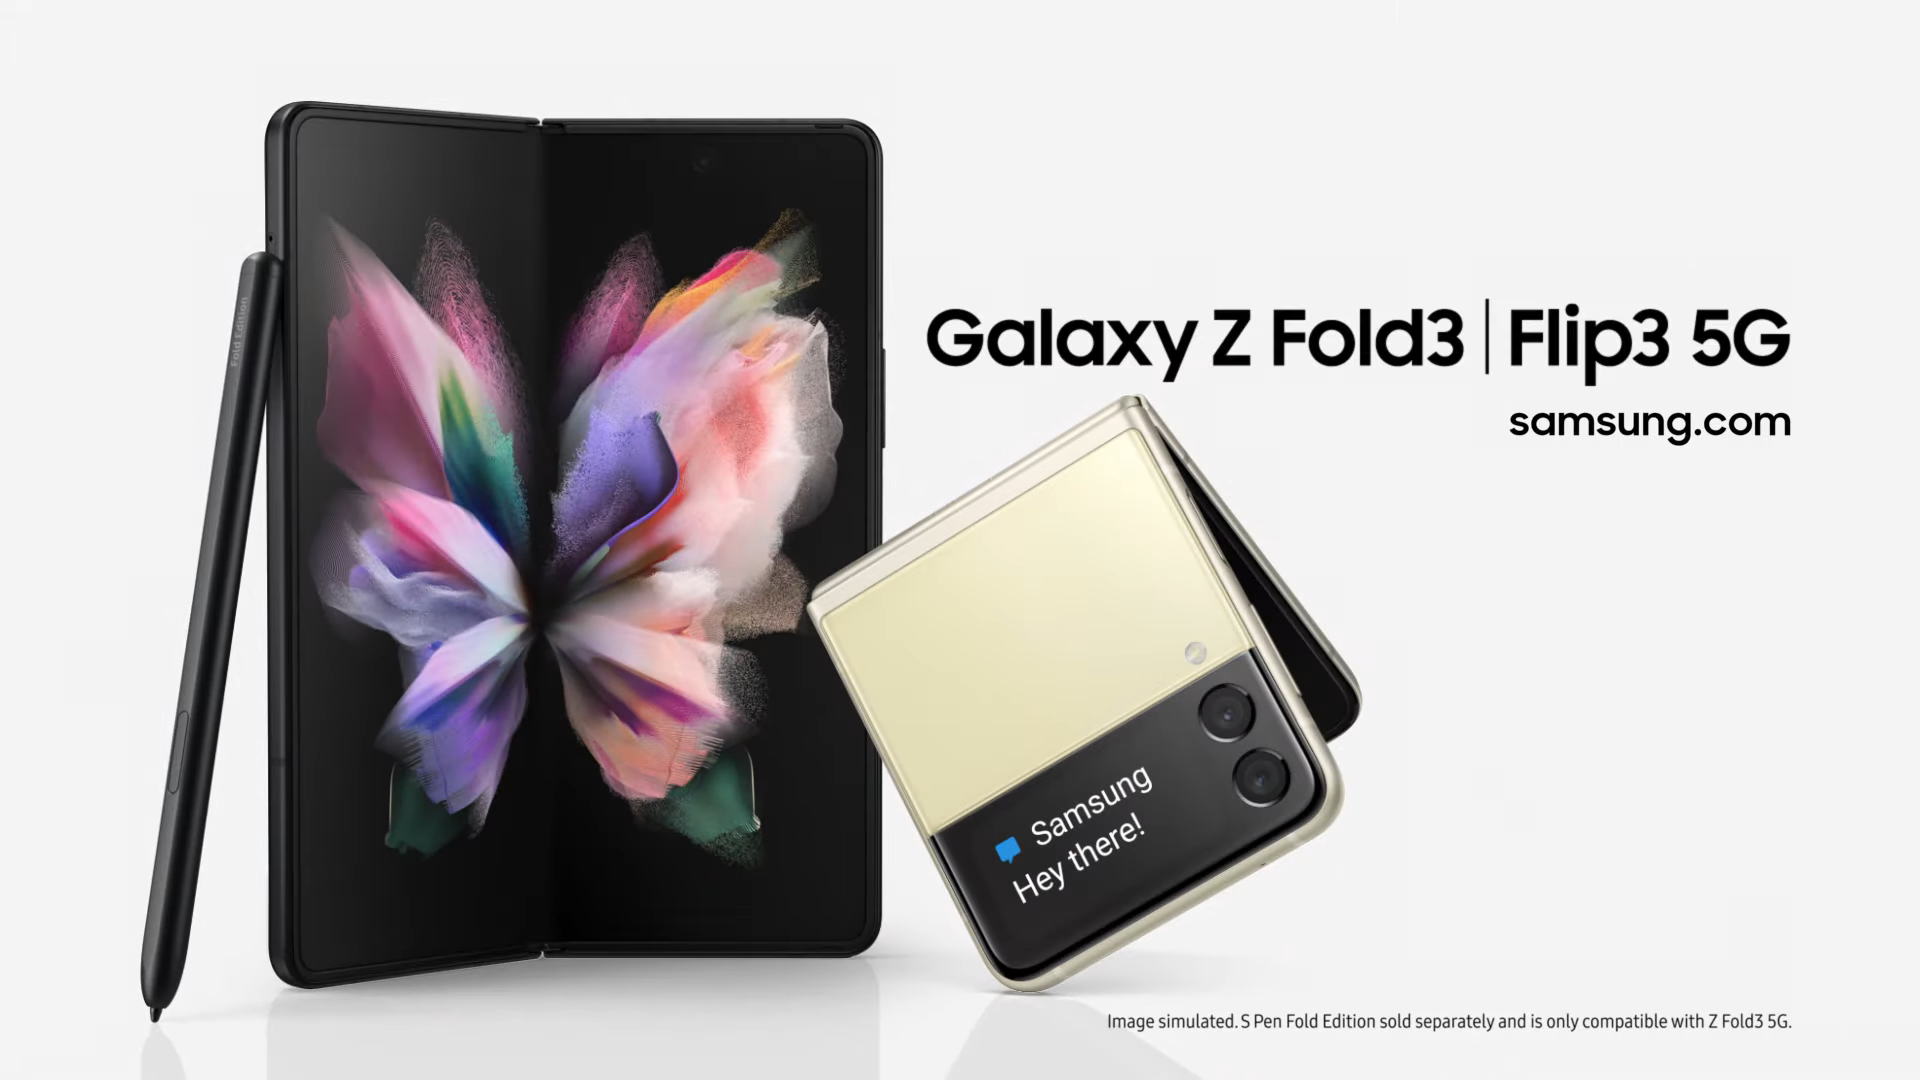 Fold and Flip samsung Galaxy Unpacked